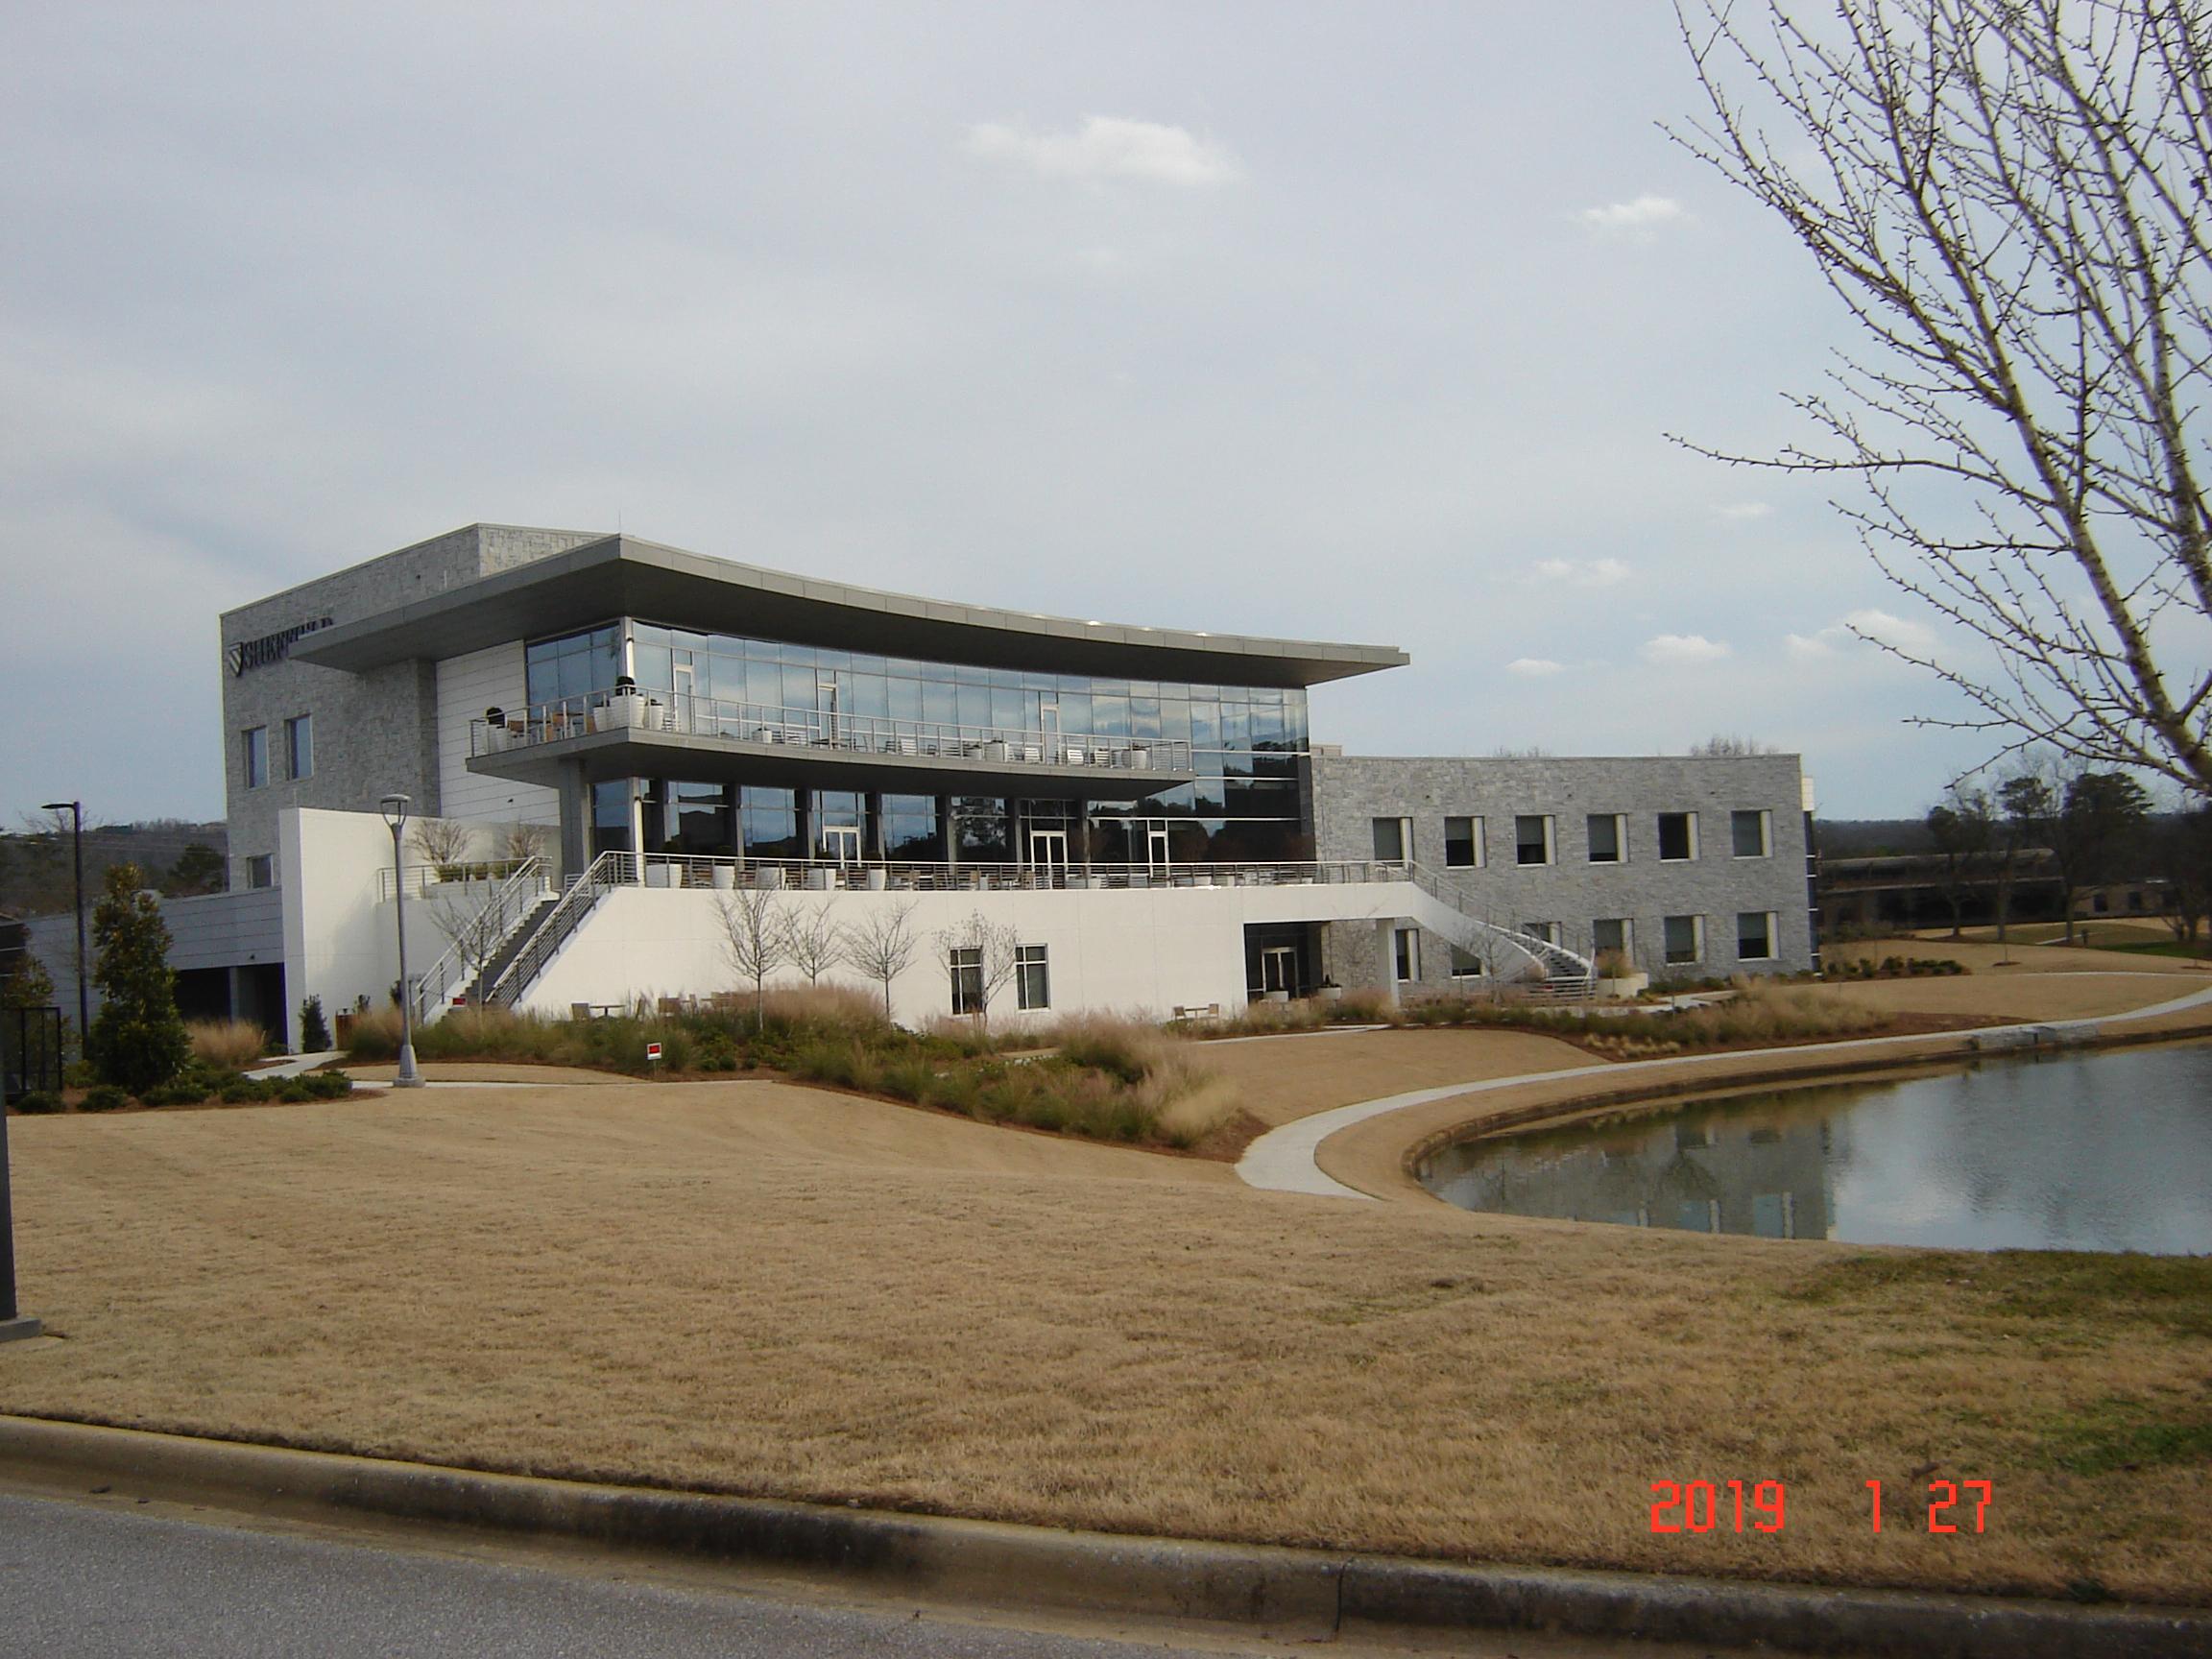 Sheffield Insurance - Hoover, Alabama